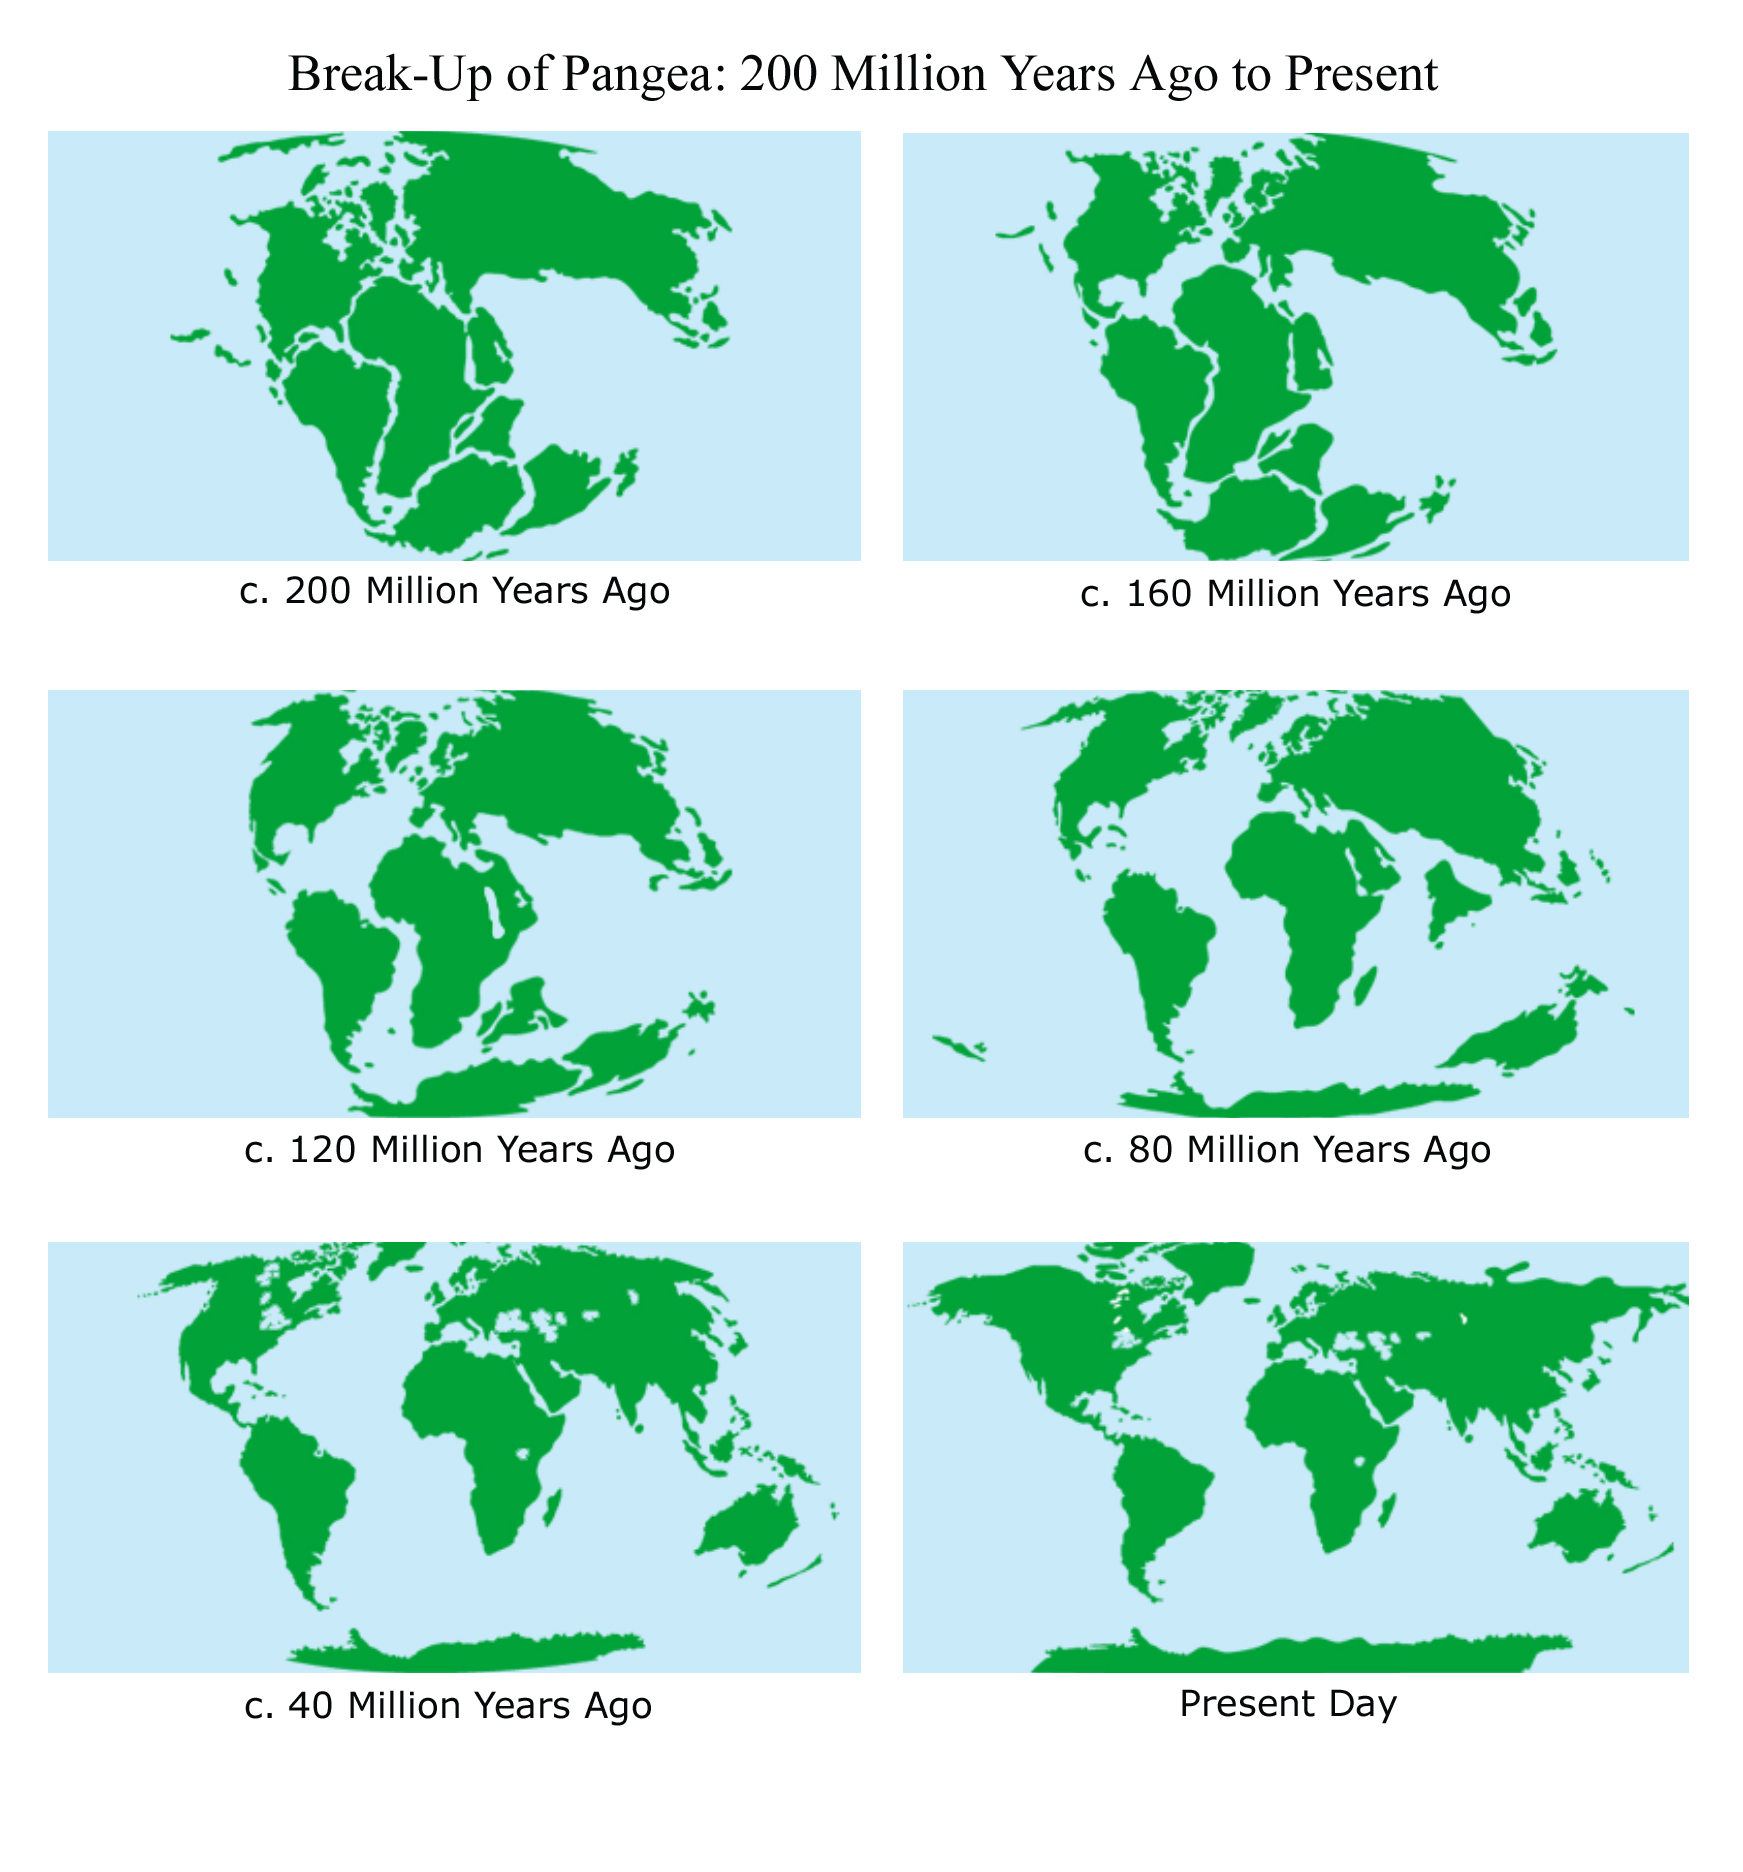 http://miraclesofthequran.persiangig.com/zmin/Pangea%20All%206%20of%206.jpg